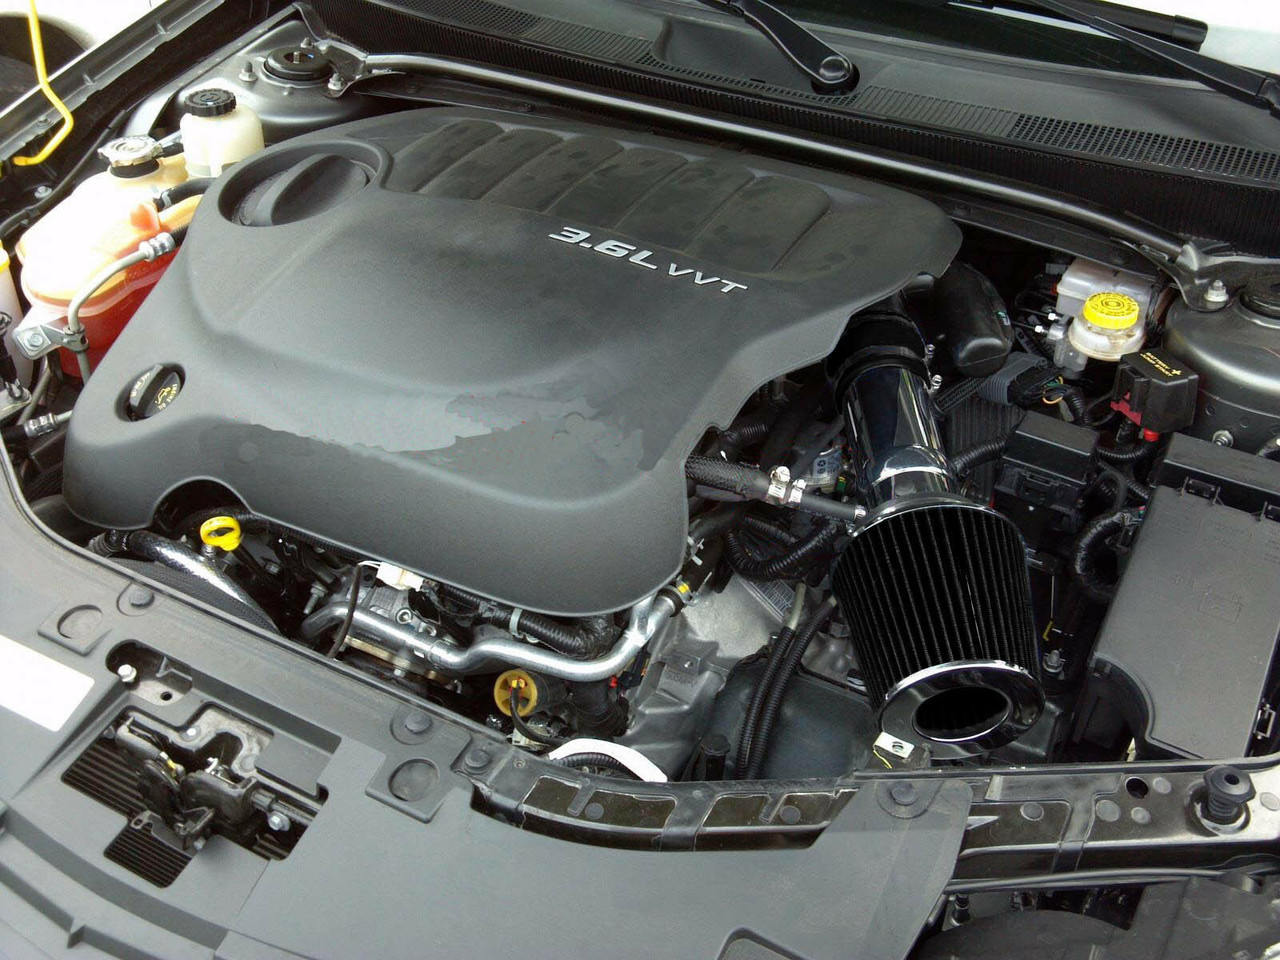 Fits Dodge Avenger High-Performance Tuner Chip /& Power Tuning Programmer Boost Horsepower /& Torque!